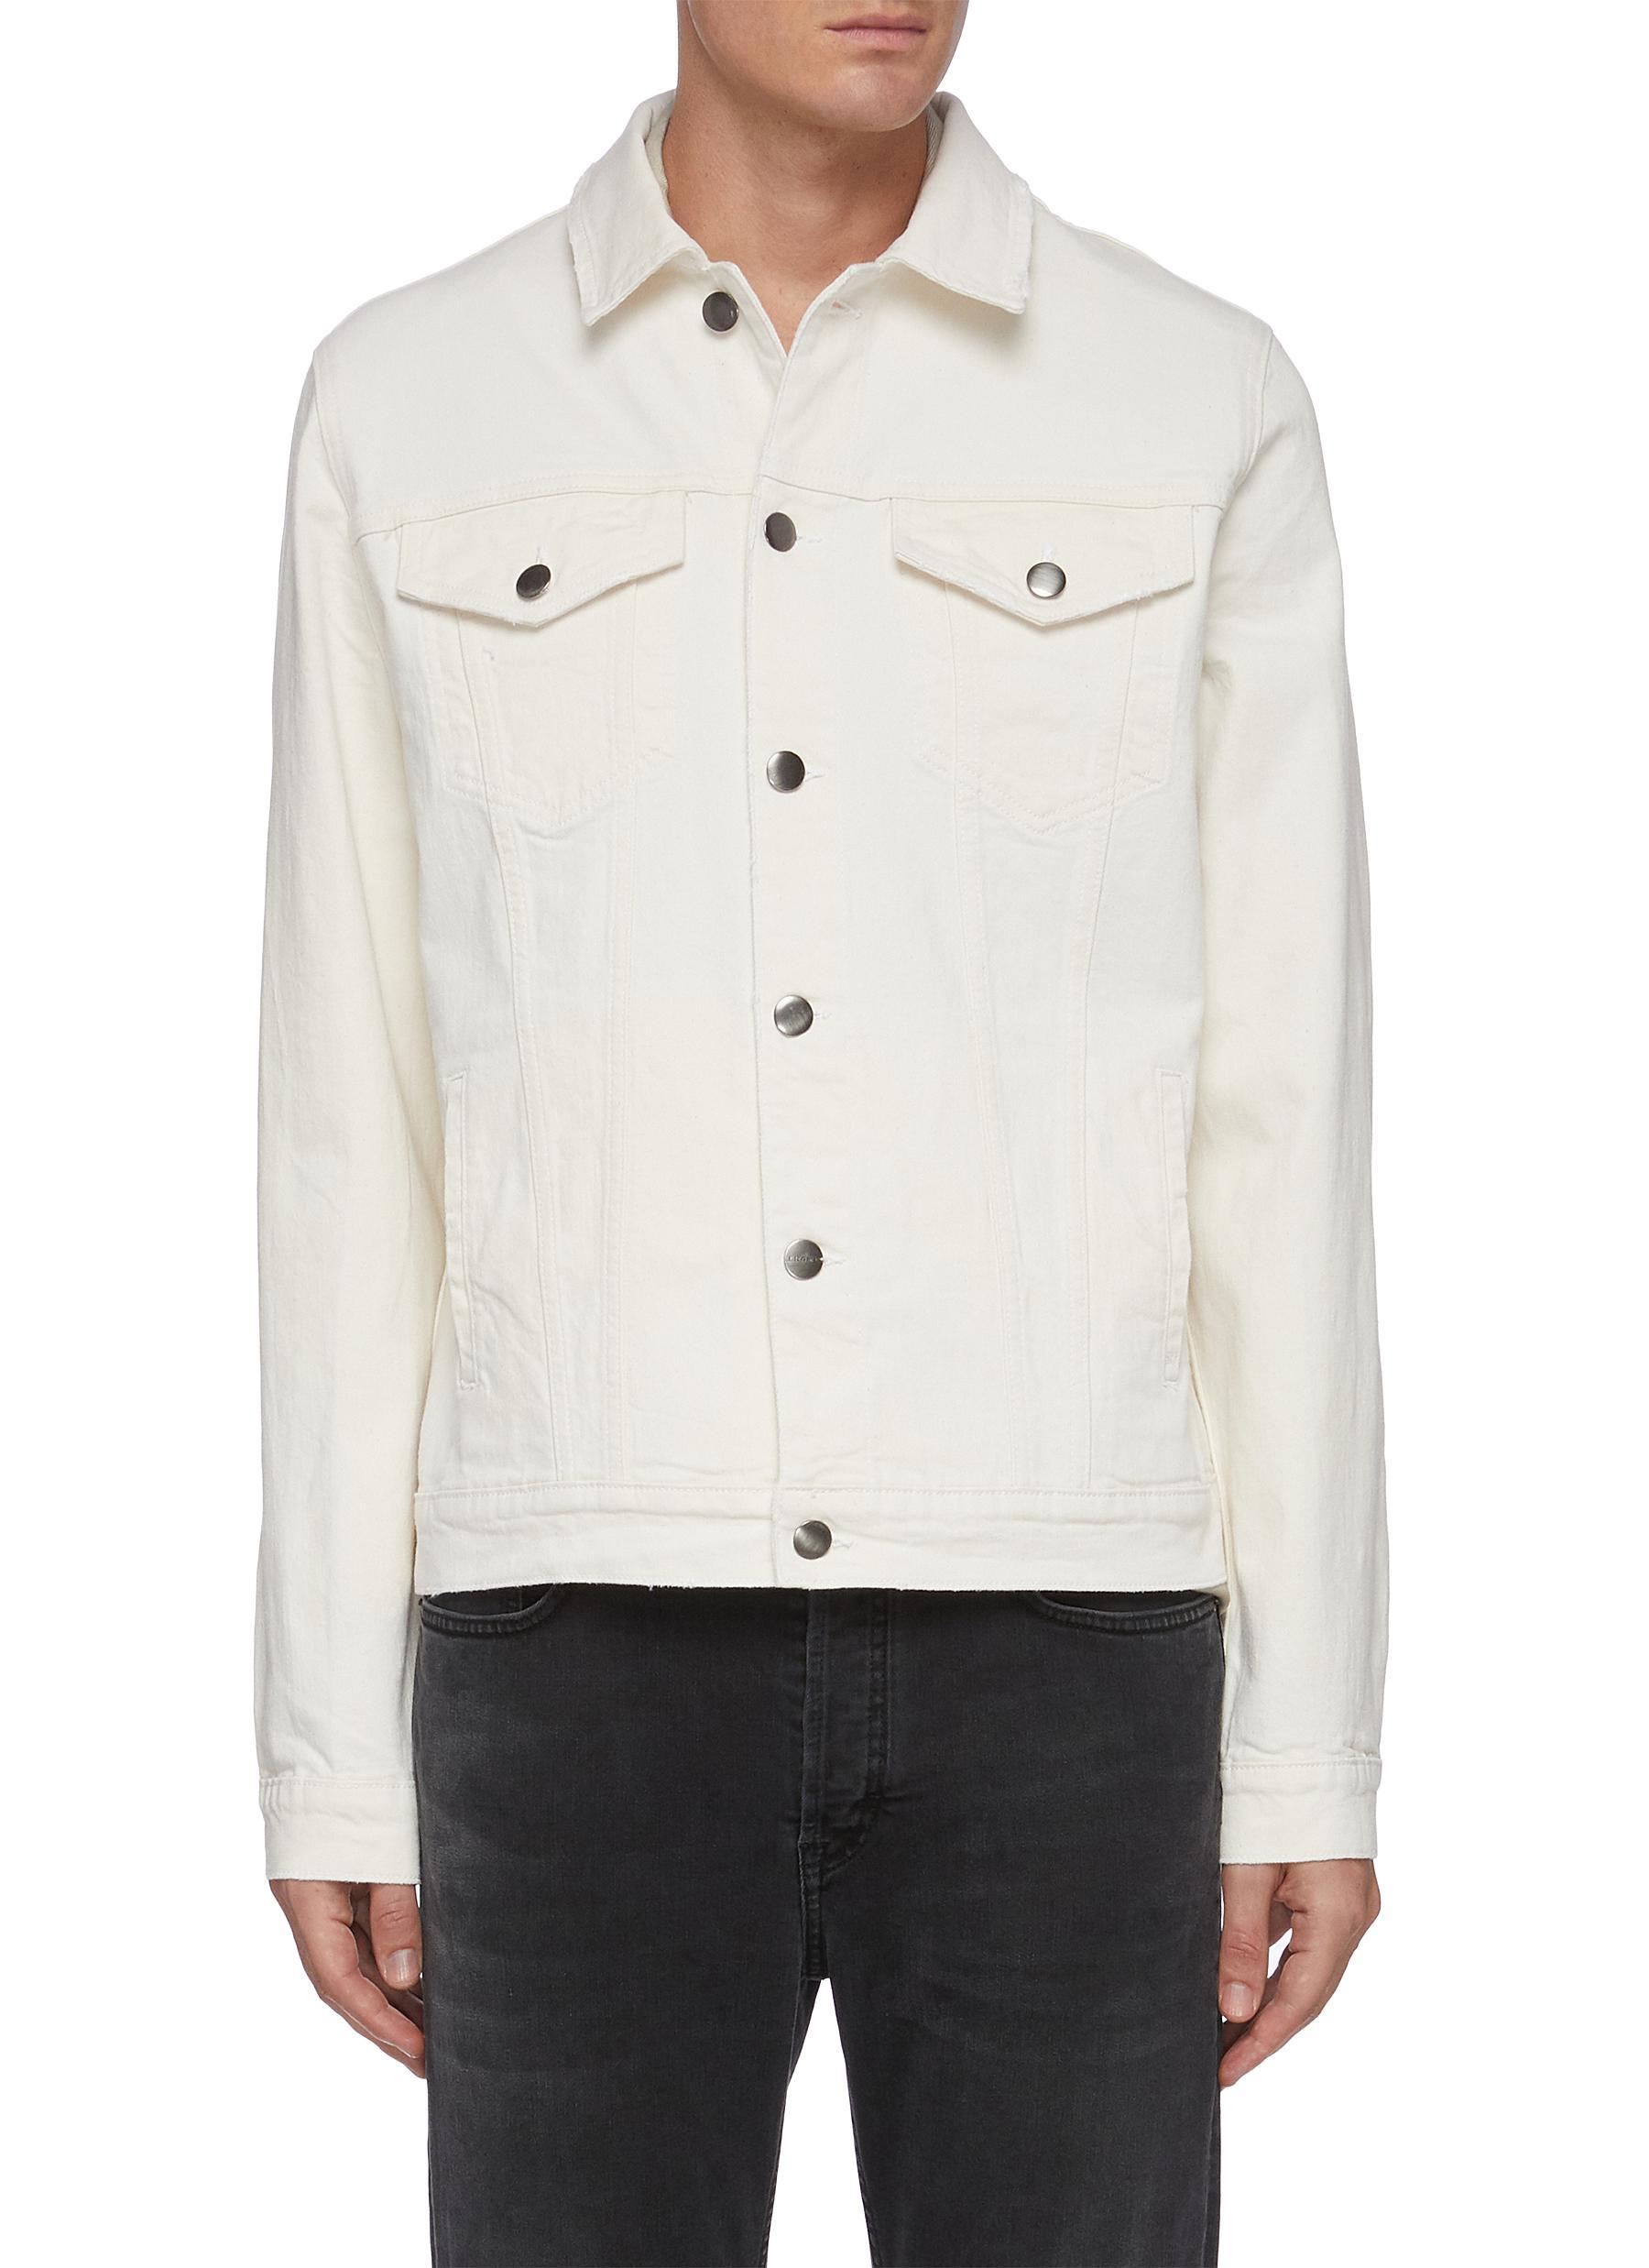 'L'Homme' Flap Pocket Denim Jacket